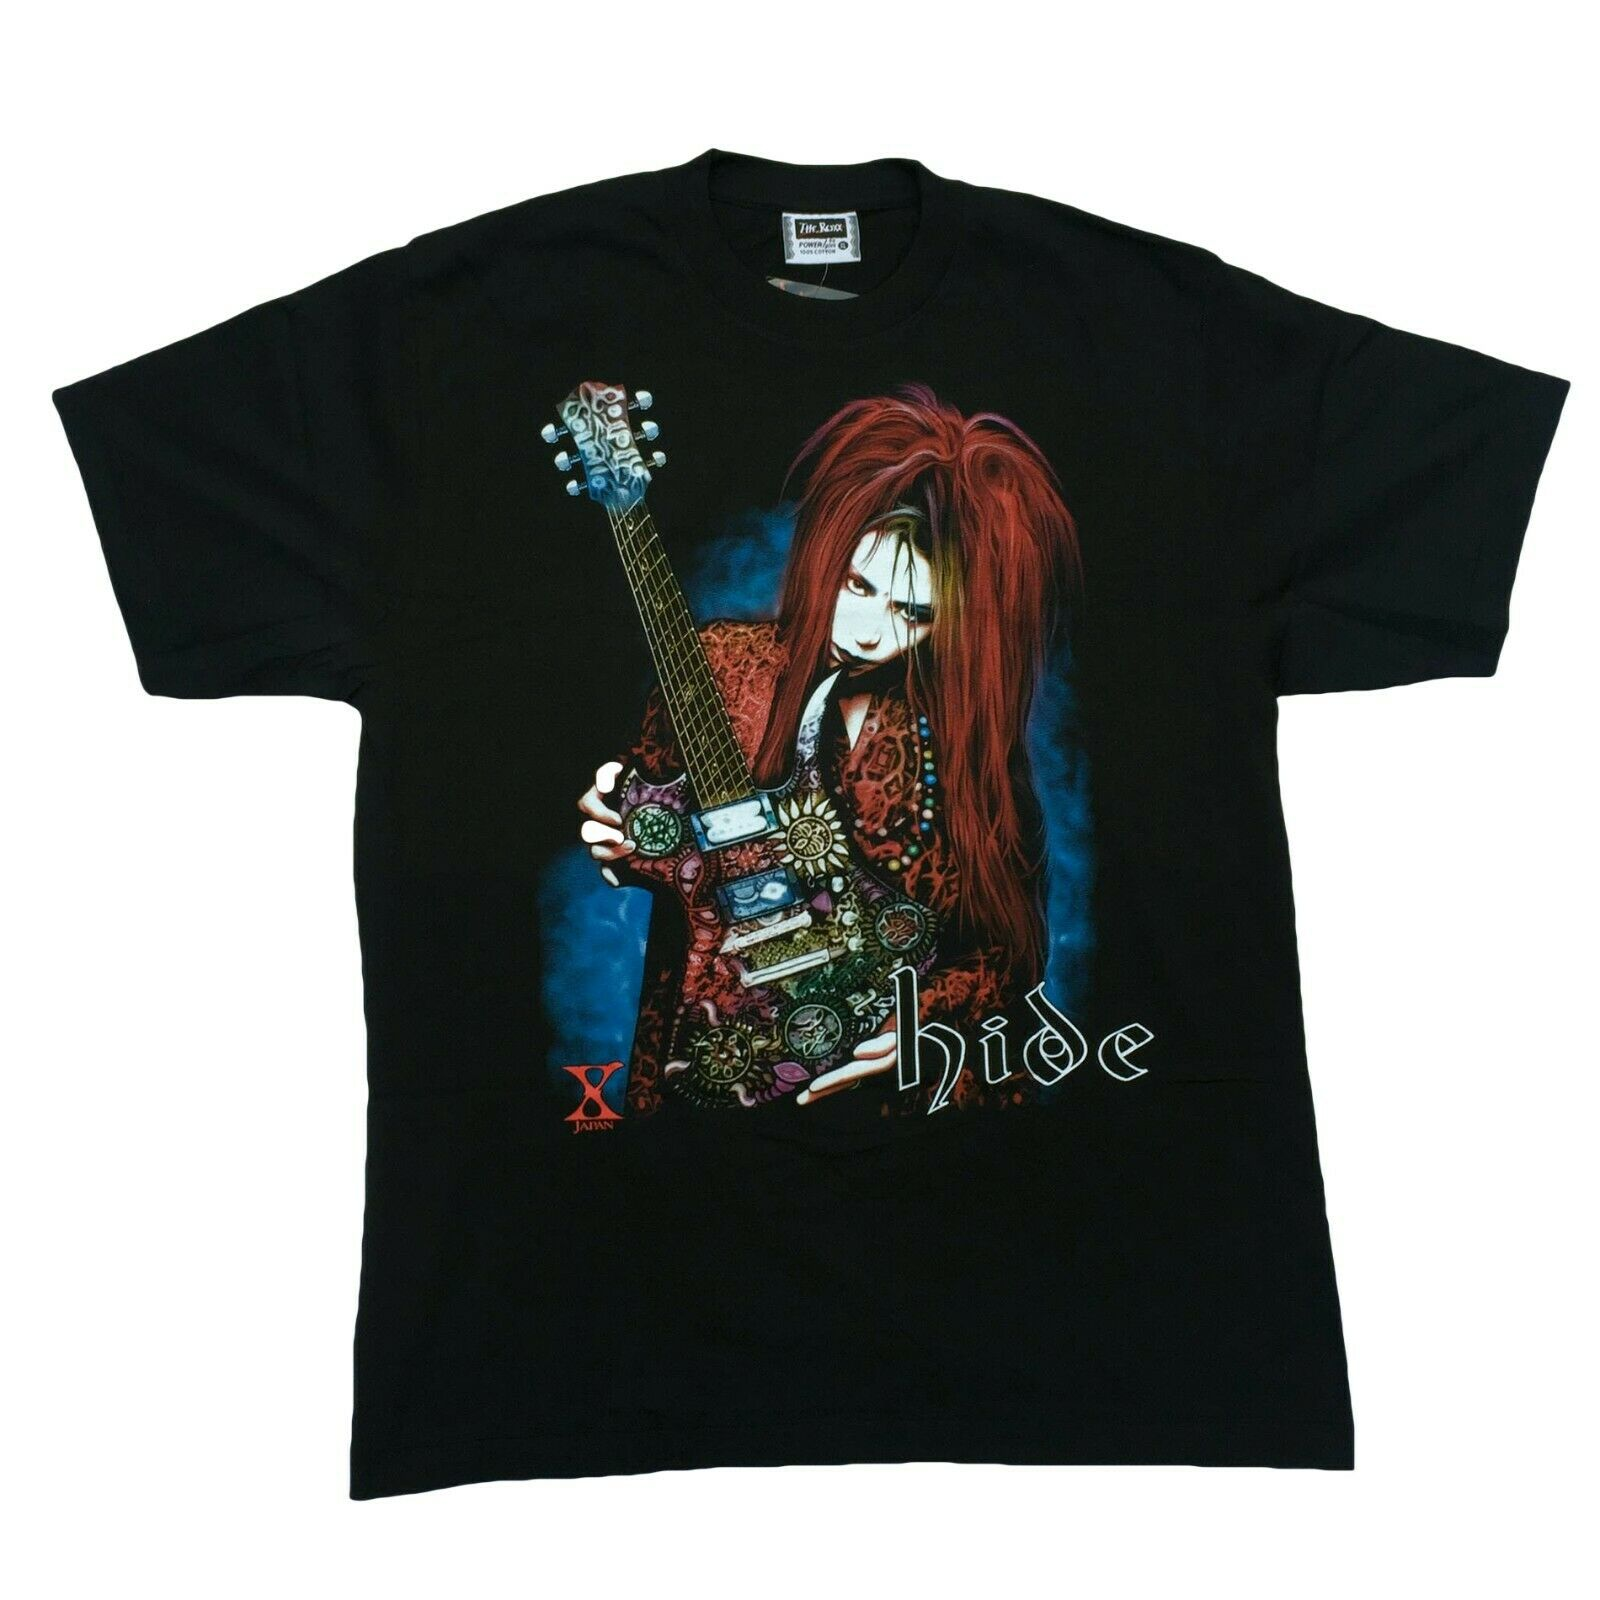 Hide X Japan T-Shirt Size Xl Deadstock Rare Vintage 90S Vtg Bootleg Nwt